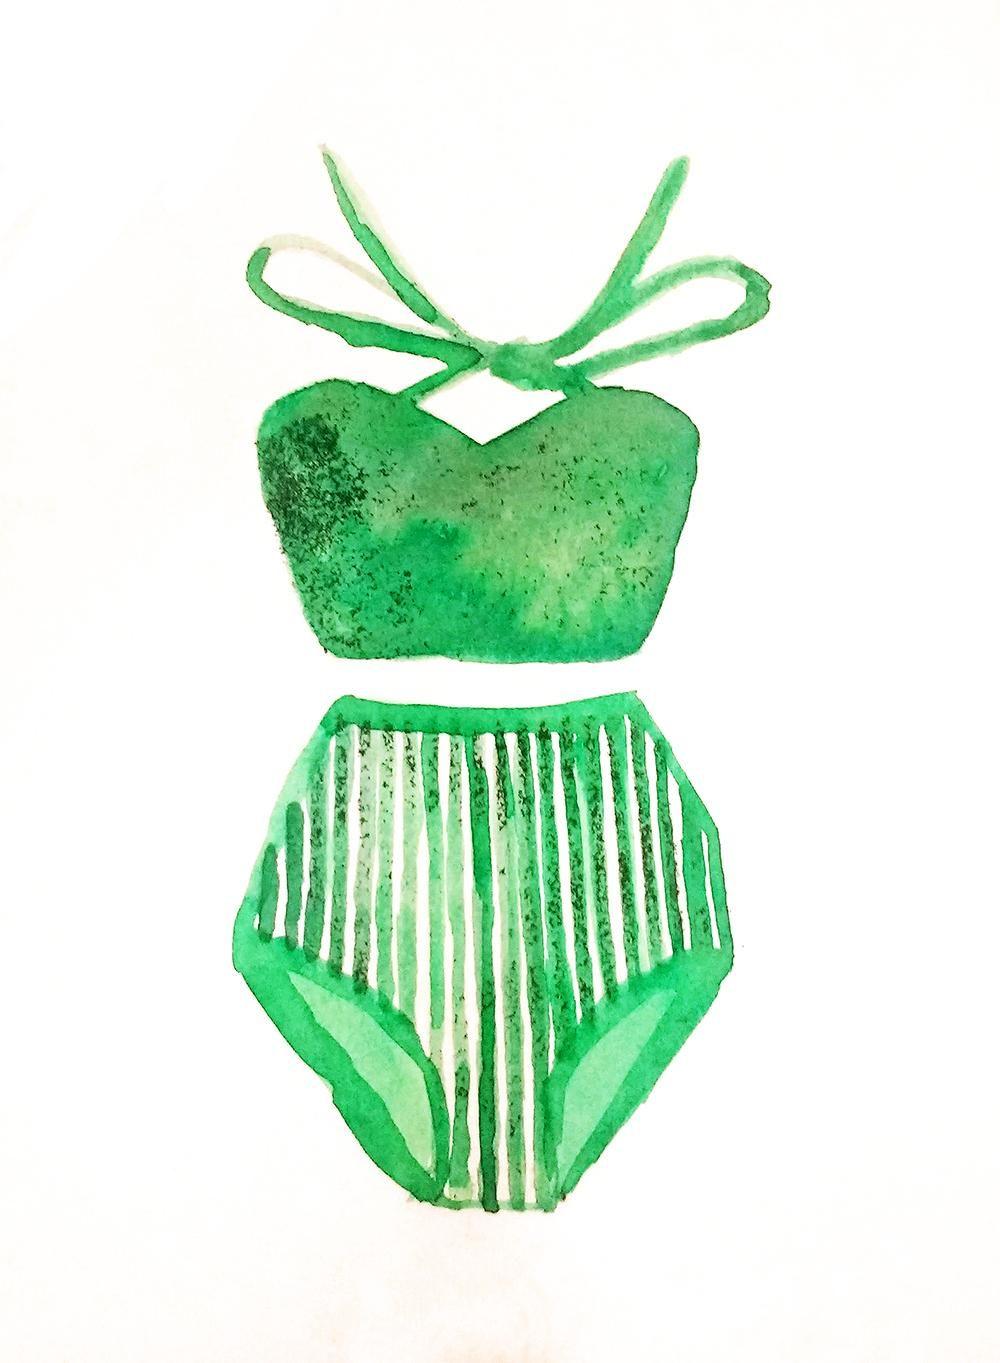 Bathing suit - image 1 - student project